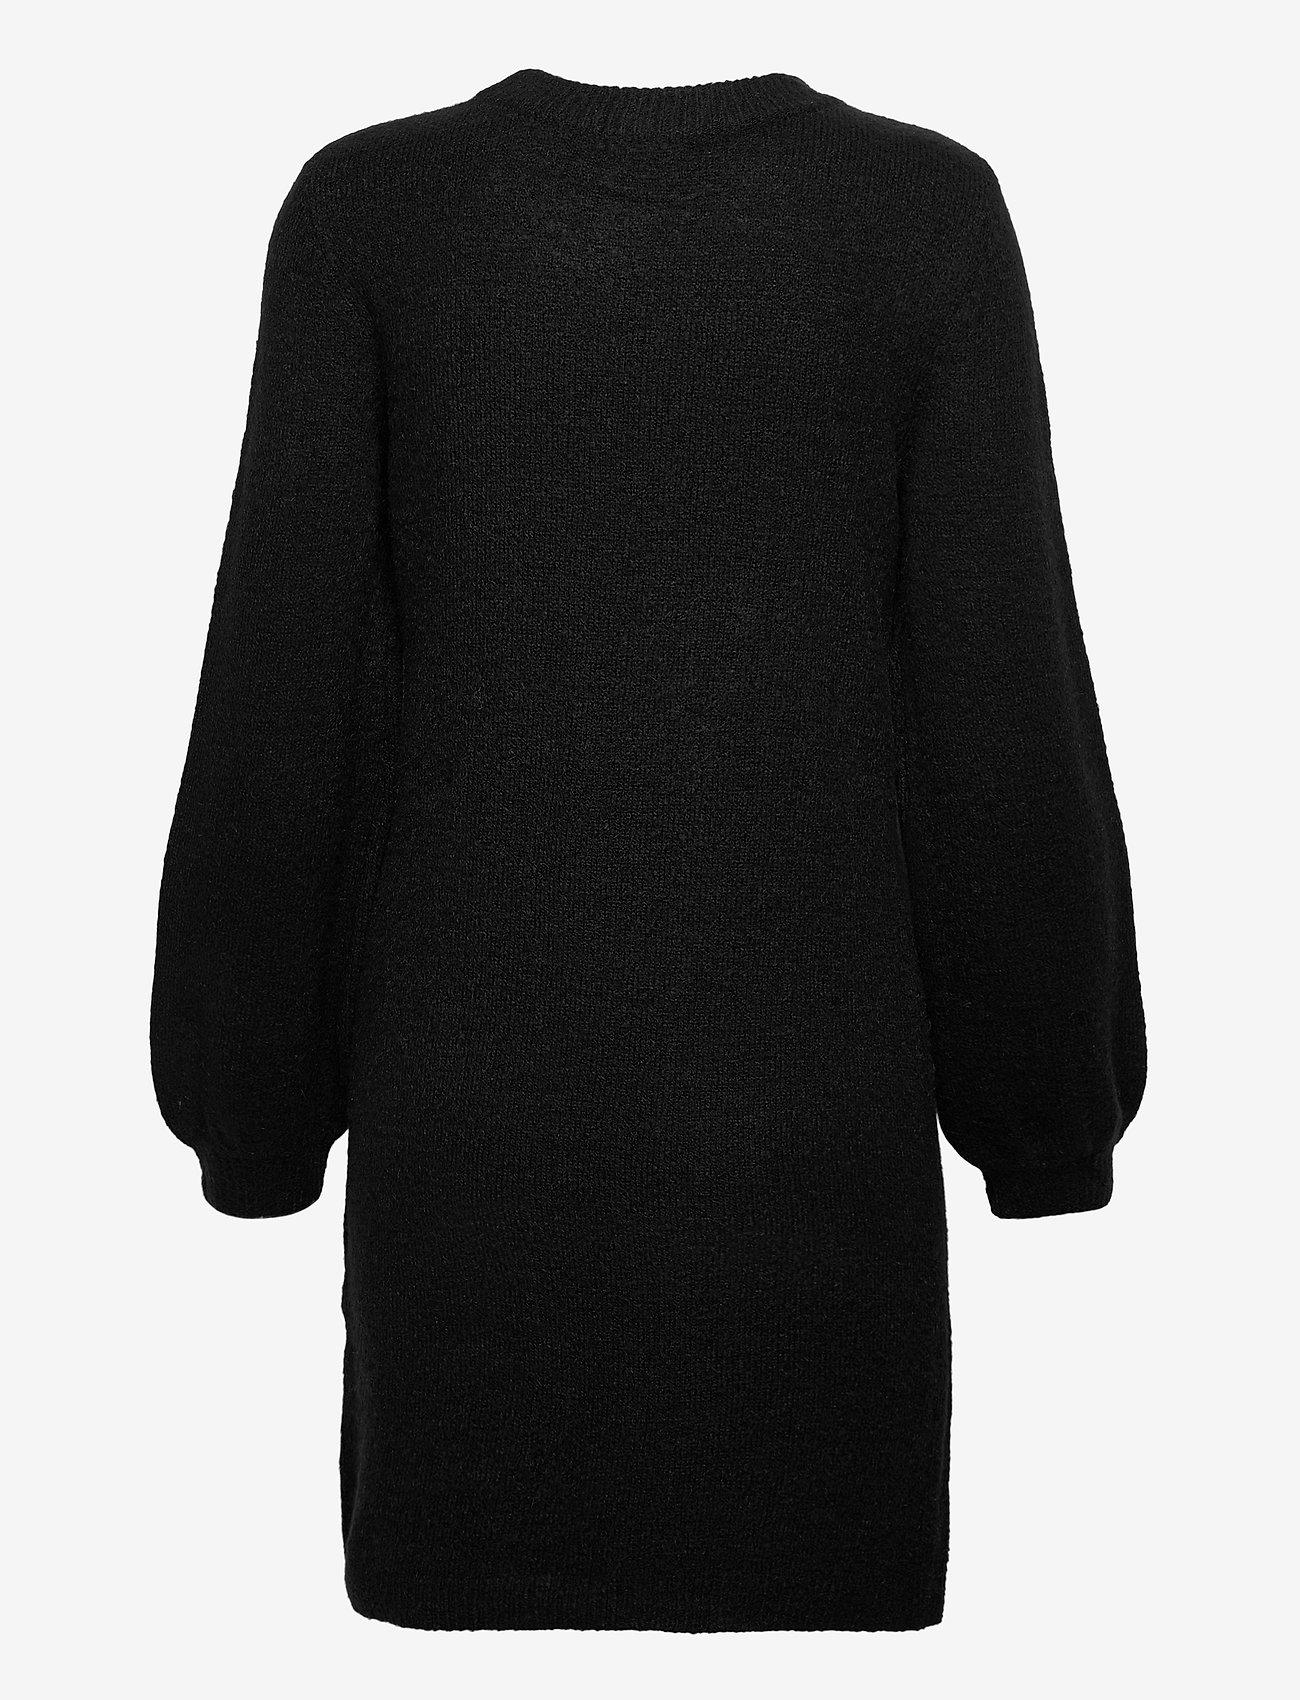 Object - OBJEVE NONSIA L/S KNIT DRESS - knitted dresses - black - 1